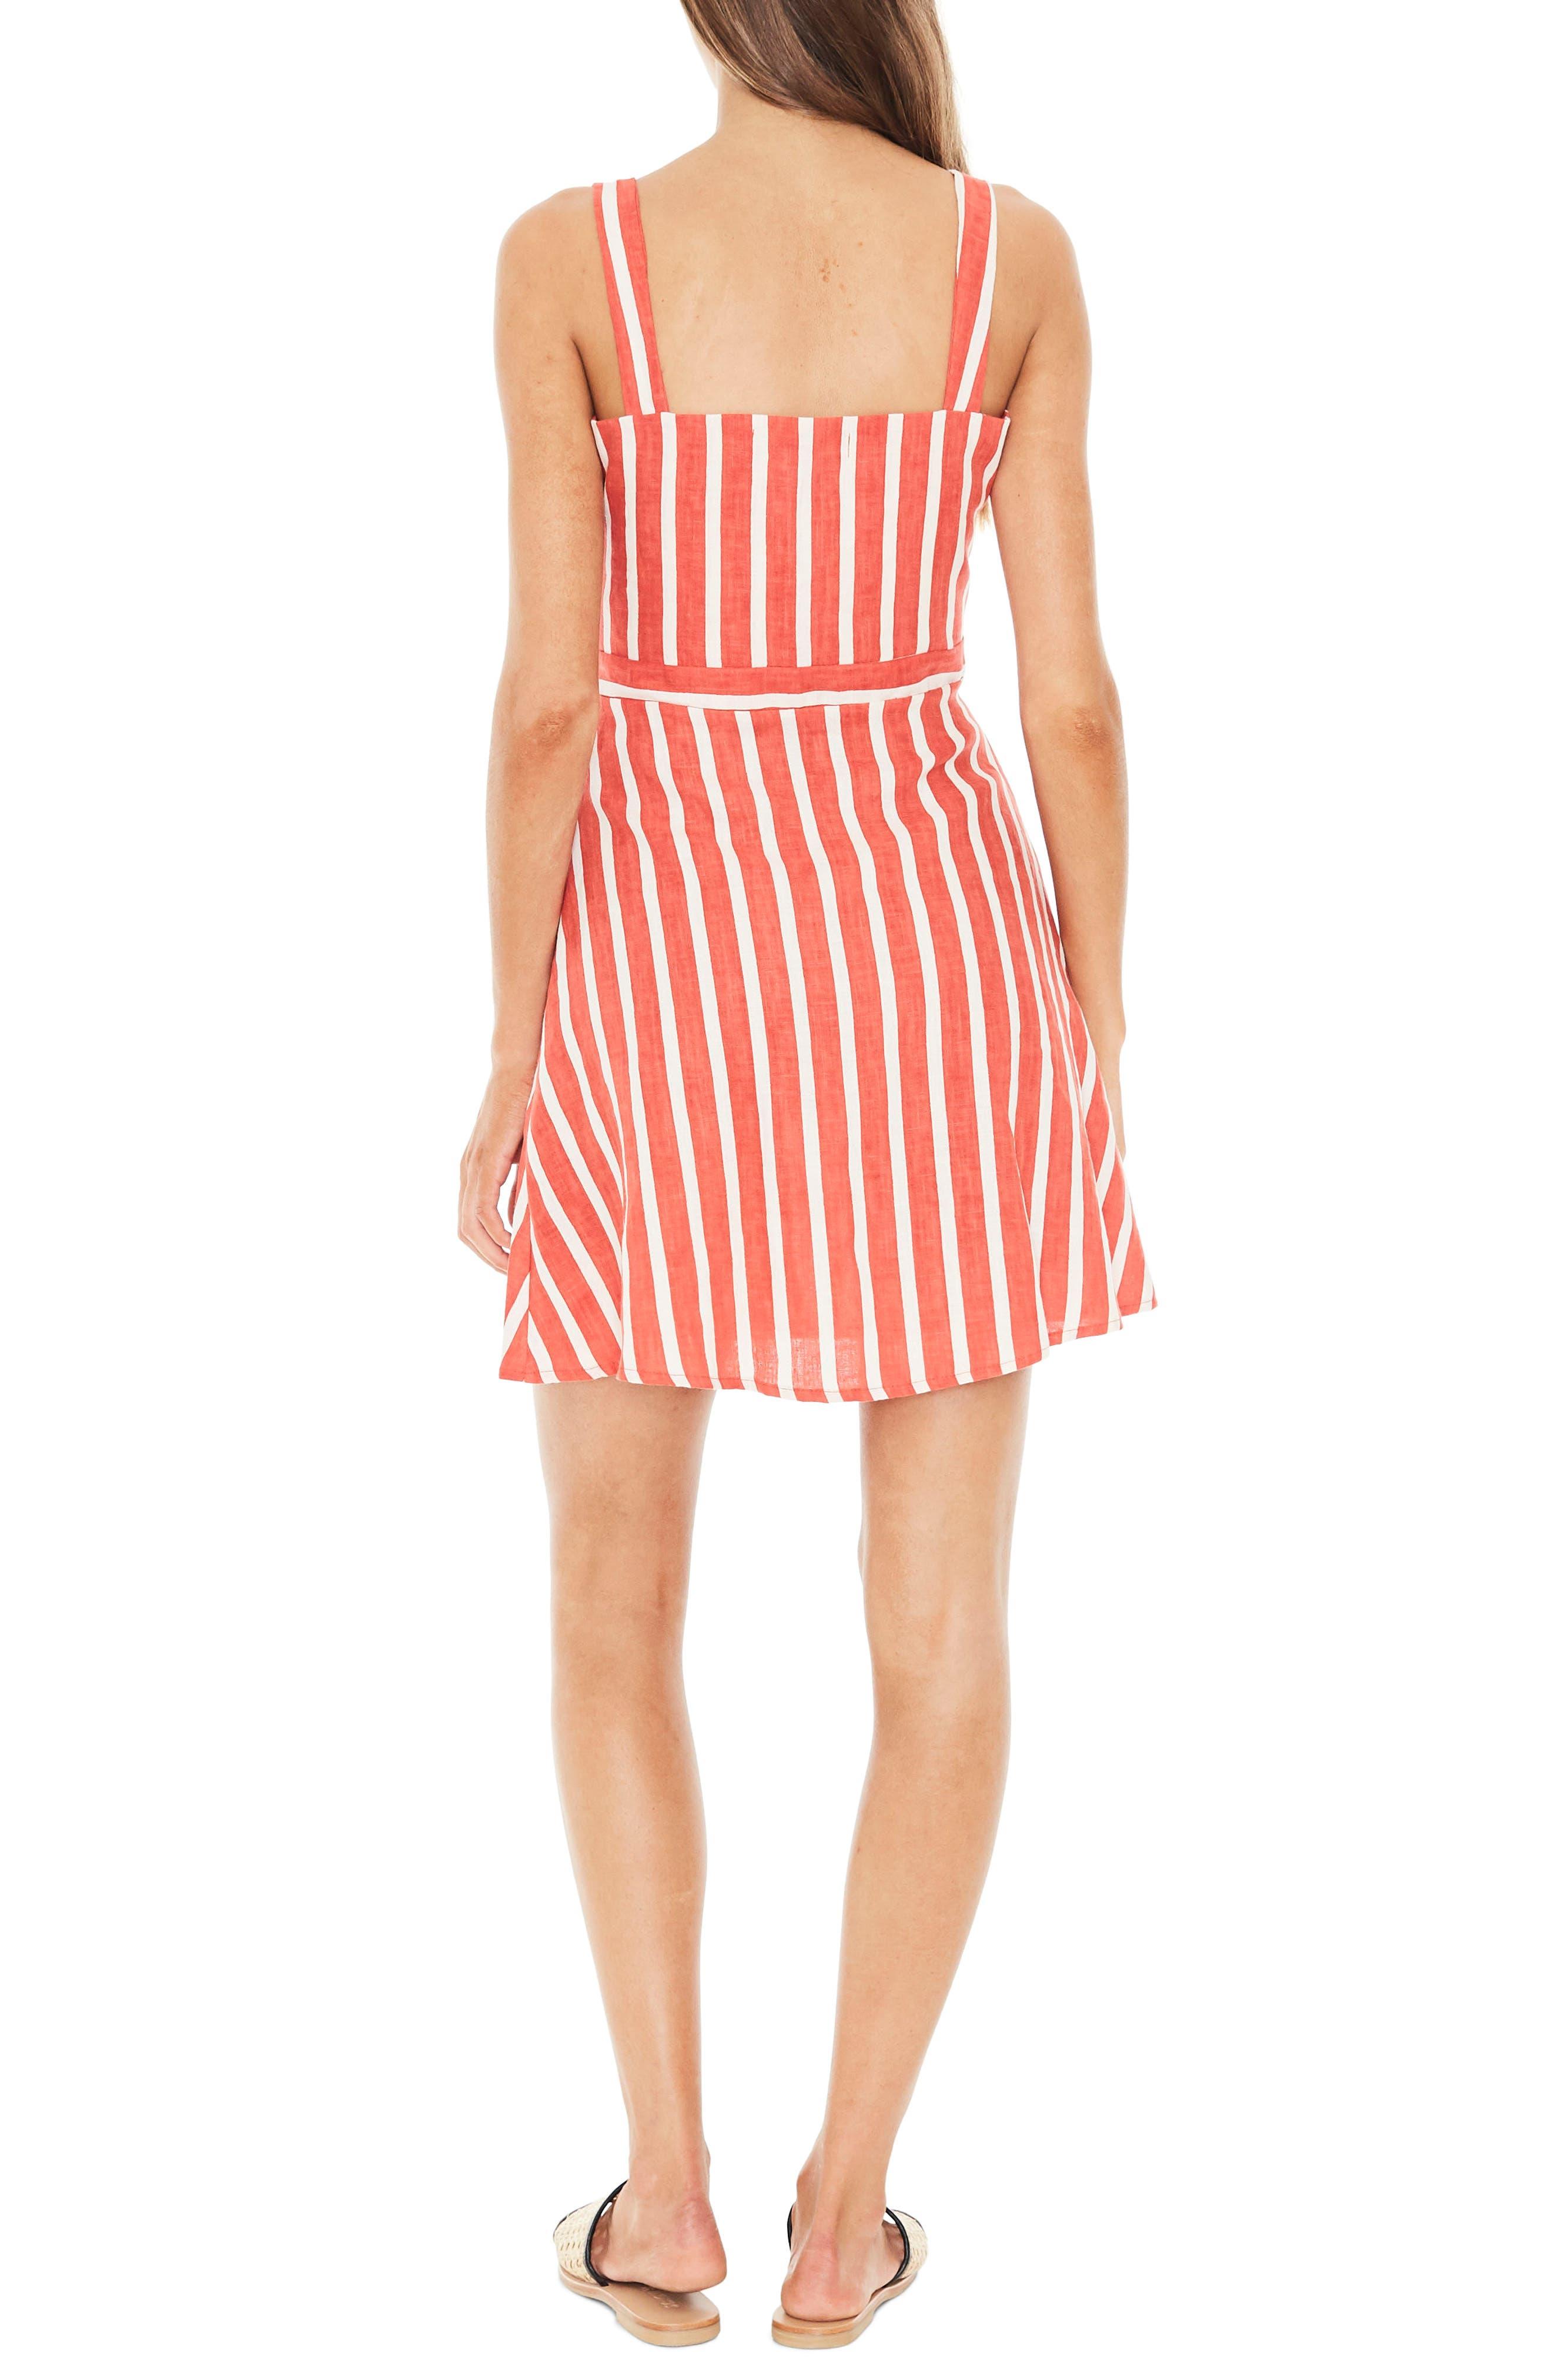 Le Petite Linen Dress,                             Alternate thumbnail 2, color,                             MAZUR STRIPE PRINT - TANGERINE